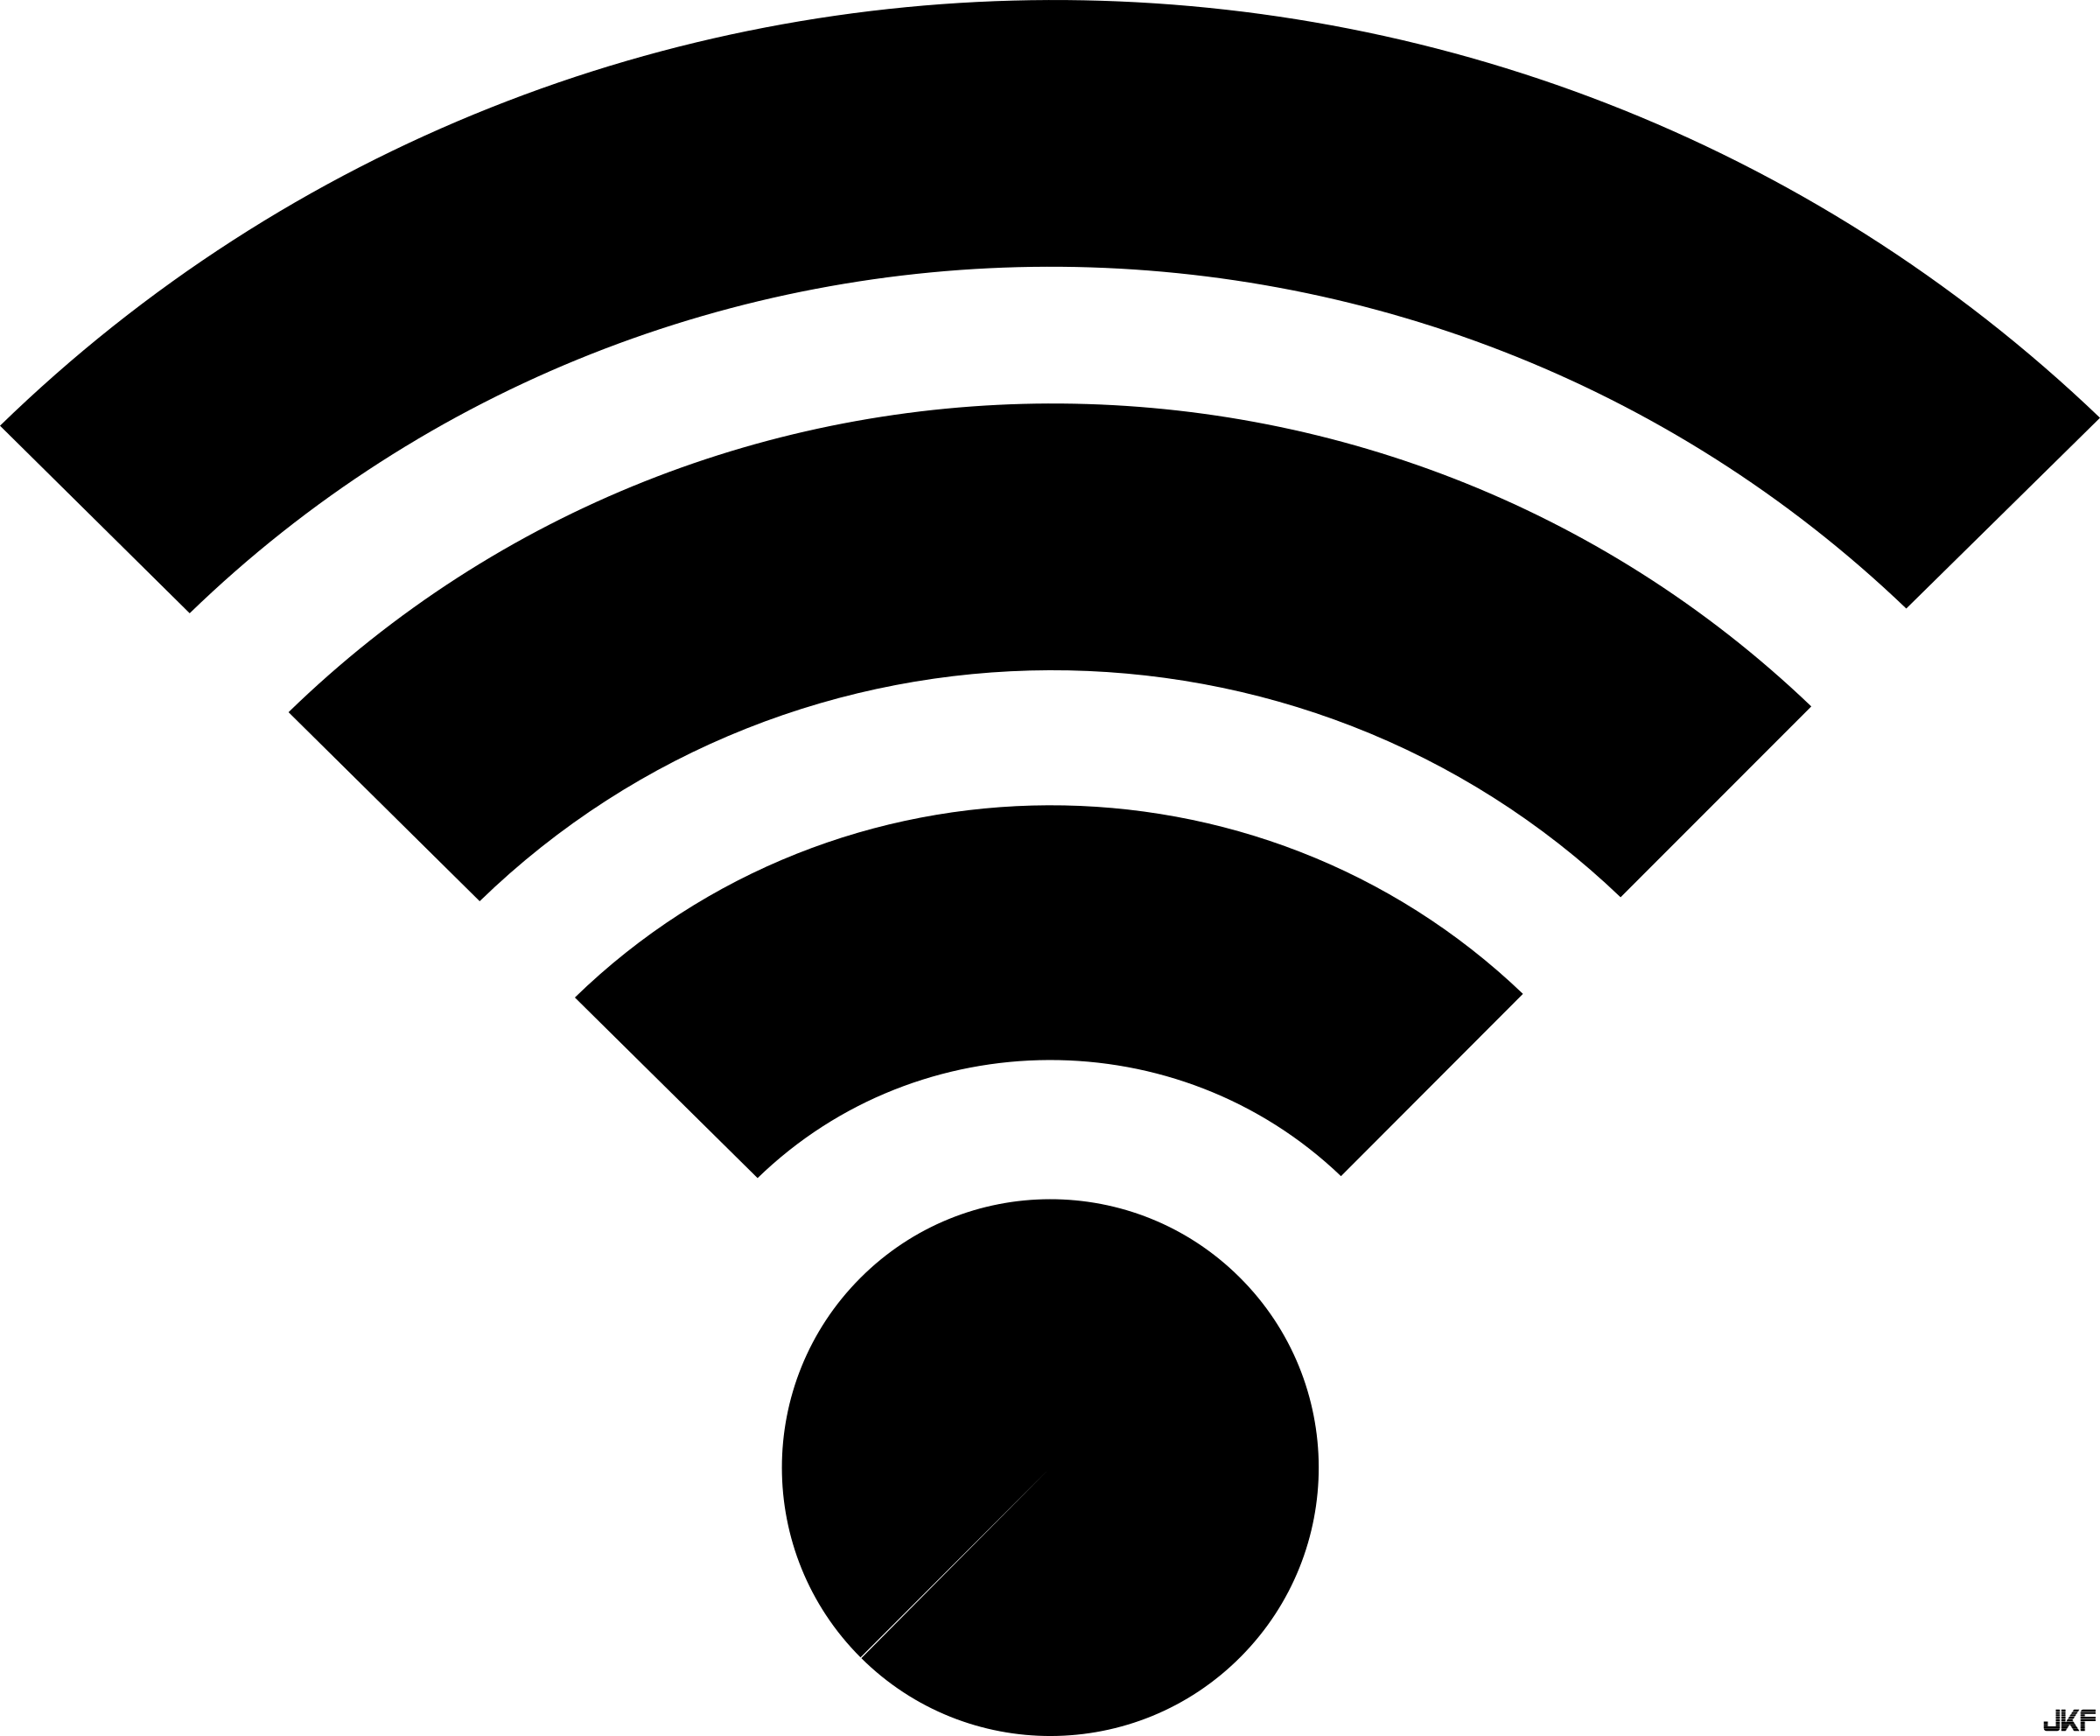 wifi-icon.jpg